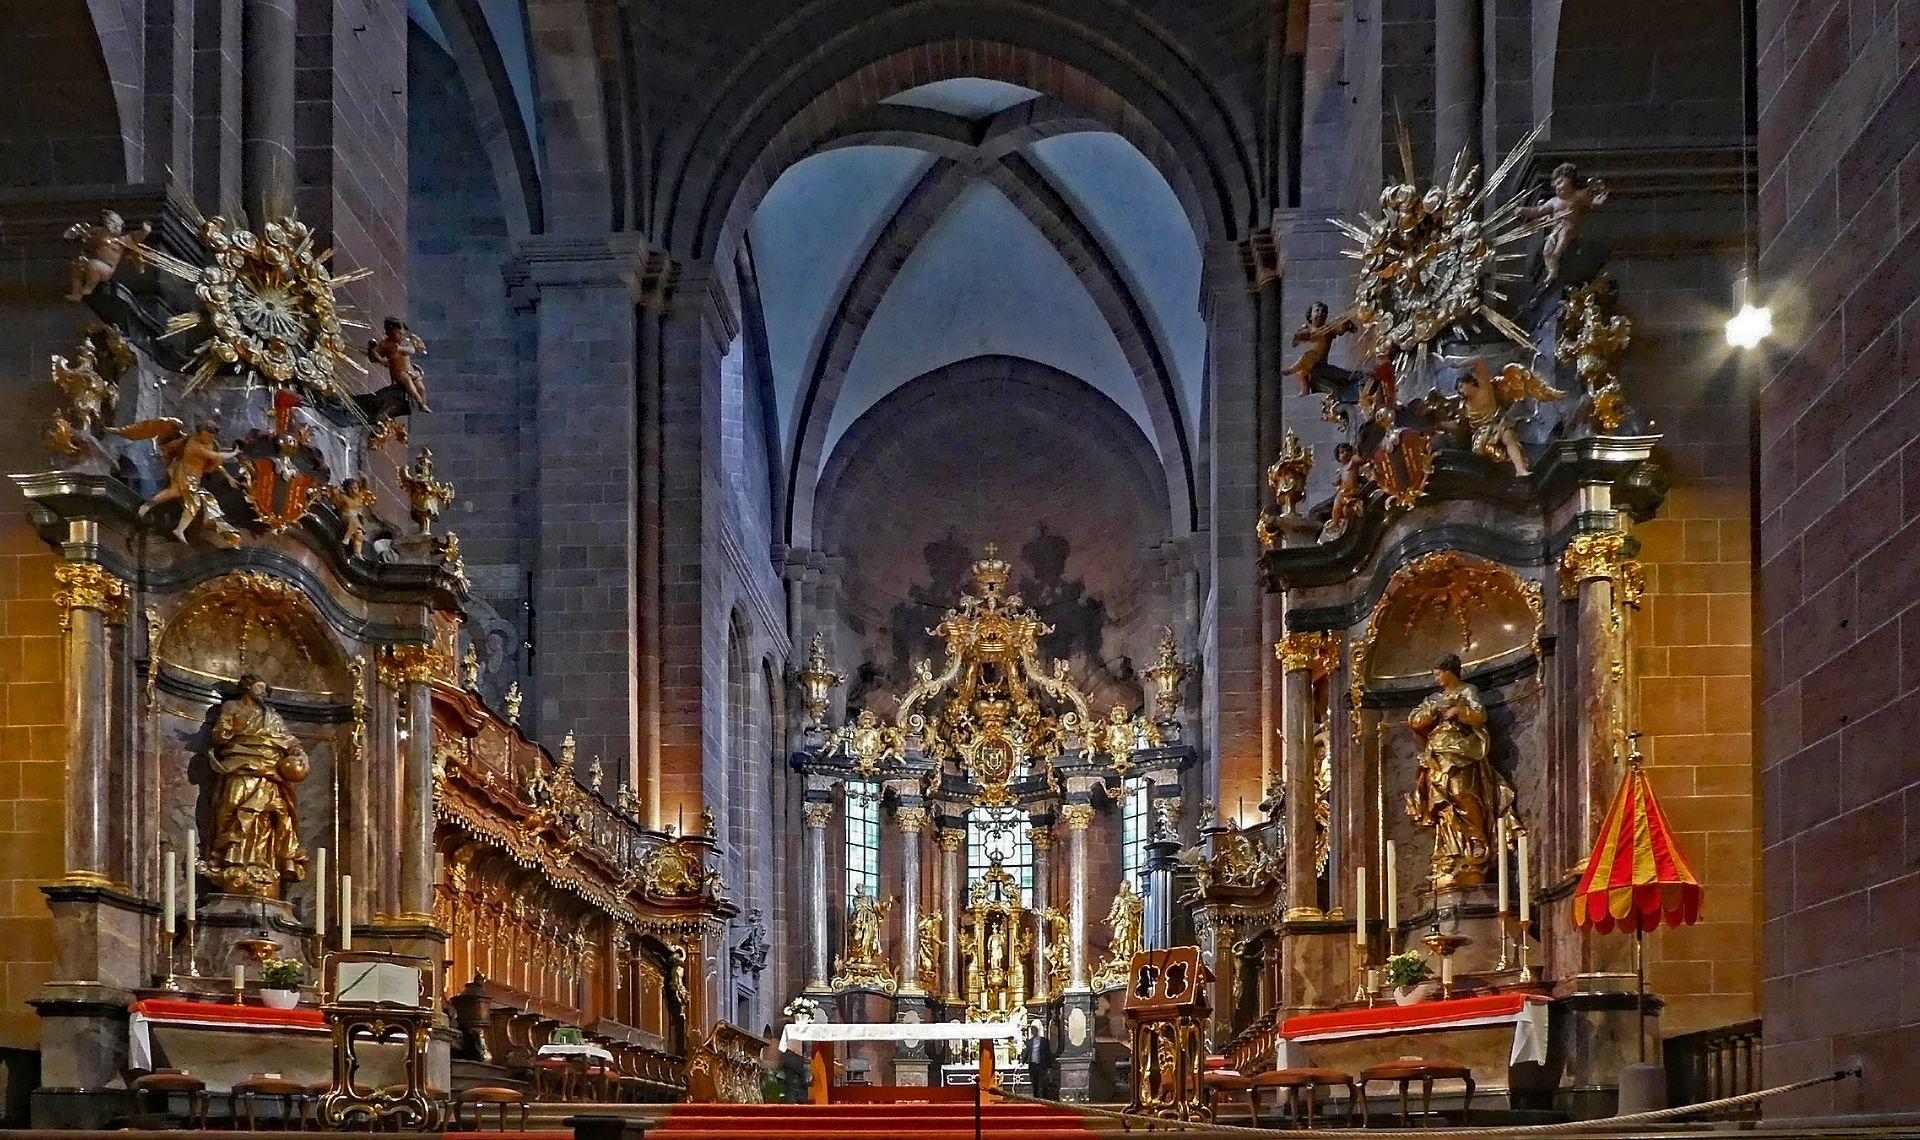 Katholischer Dom St. Peter Altarraum.jpg